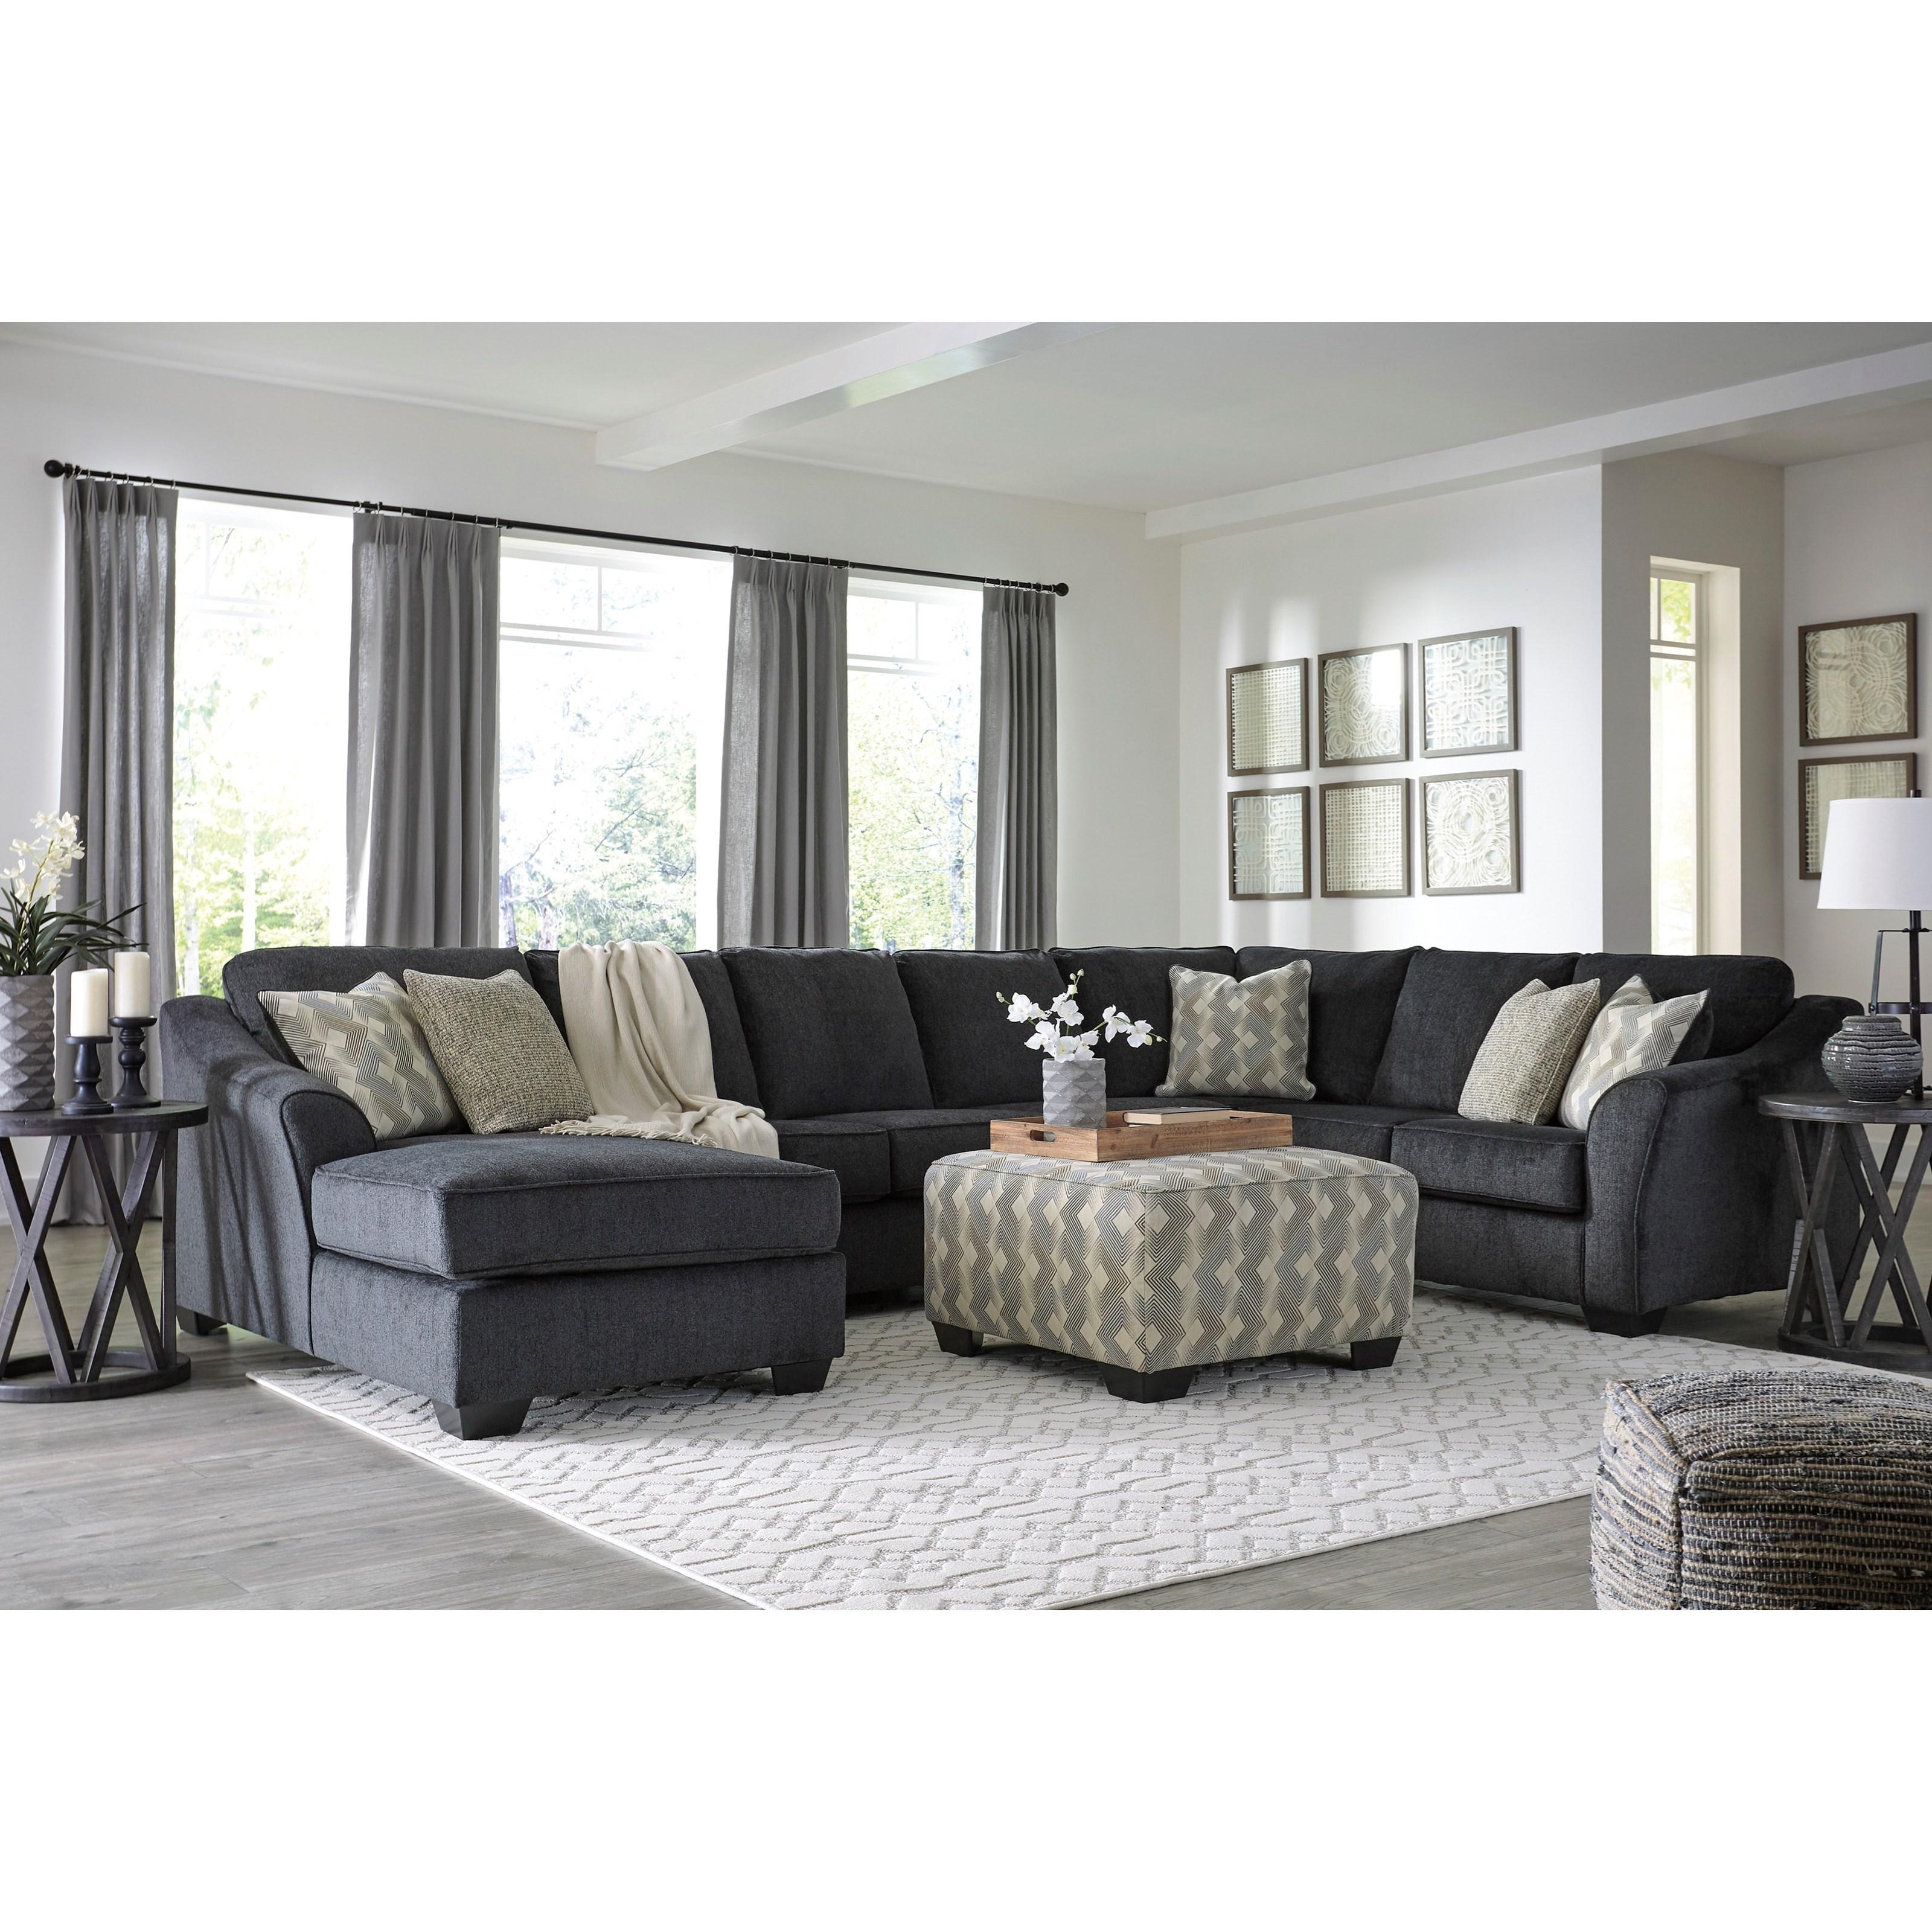 Eltmann Stationary Living Room Group by Ashley (Signature Design) at Johnny Janosik